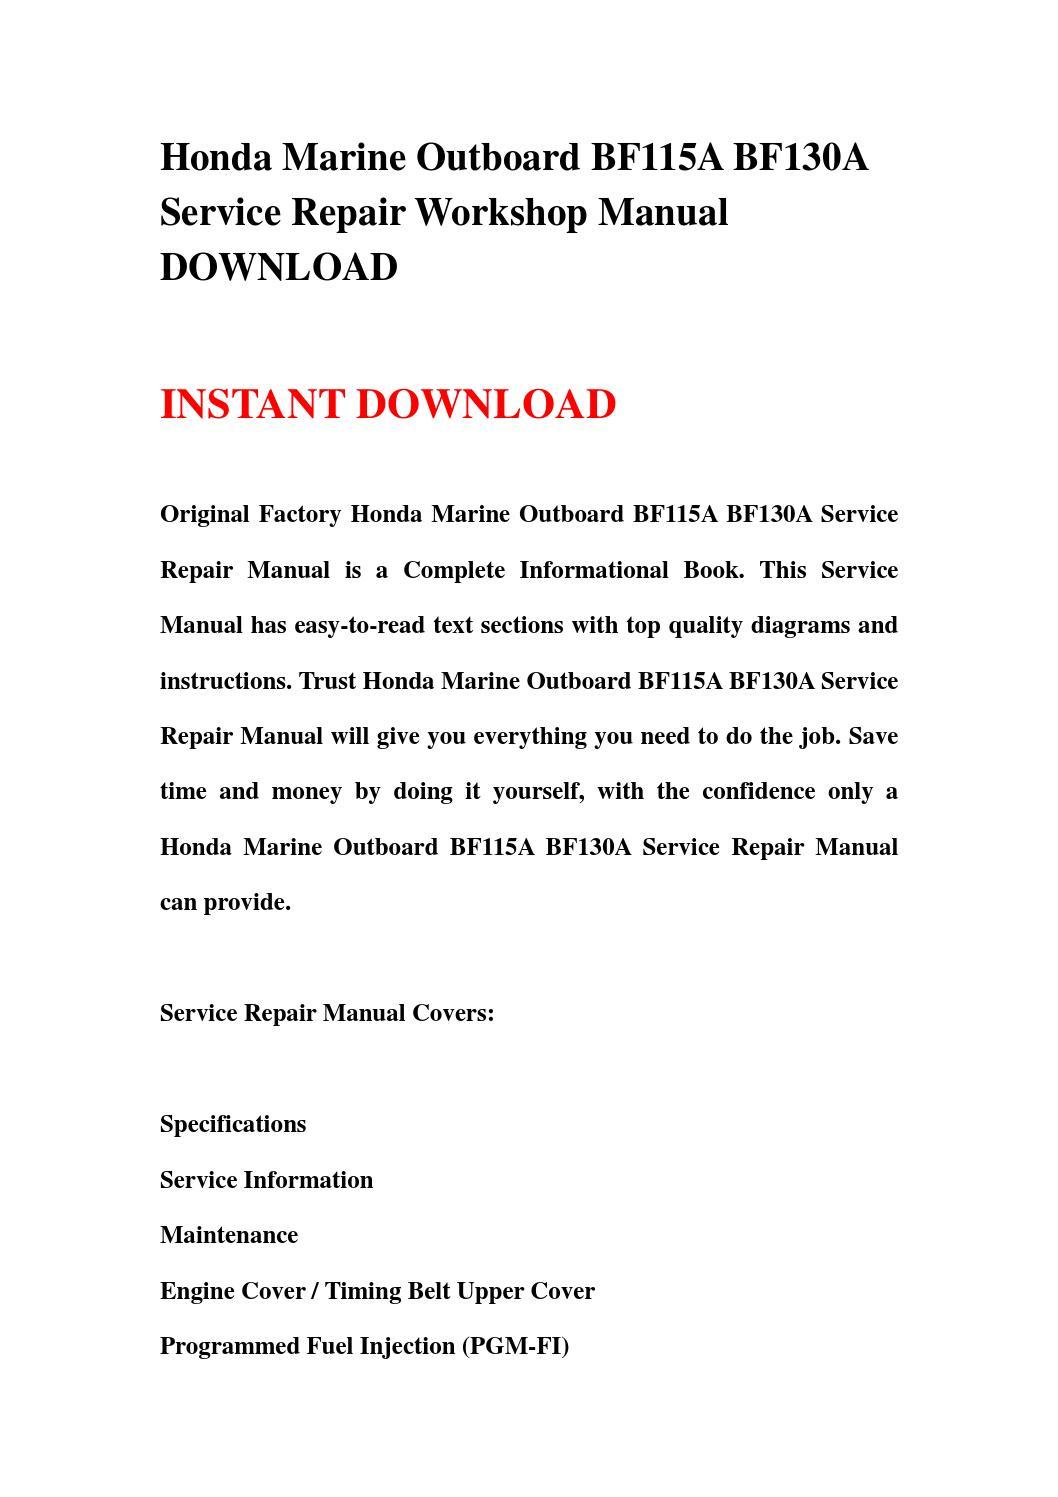 Honda marine outboard bf115a bf130a service repair workshop manual download  by hnfgsfnn - issuu